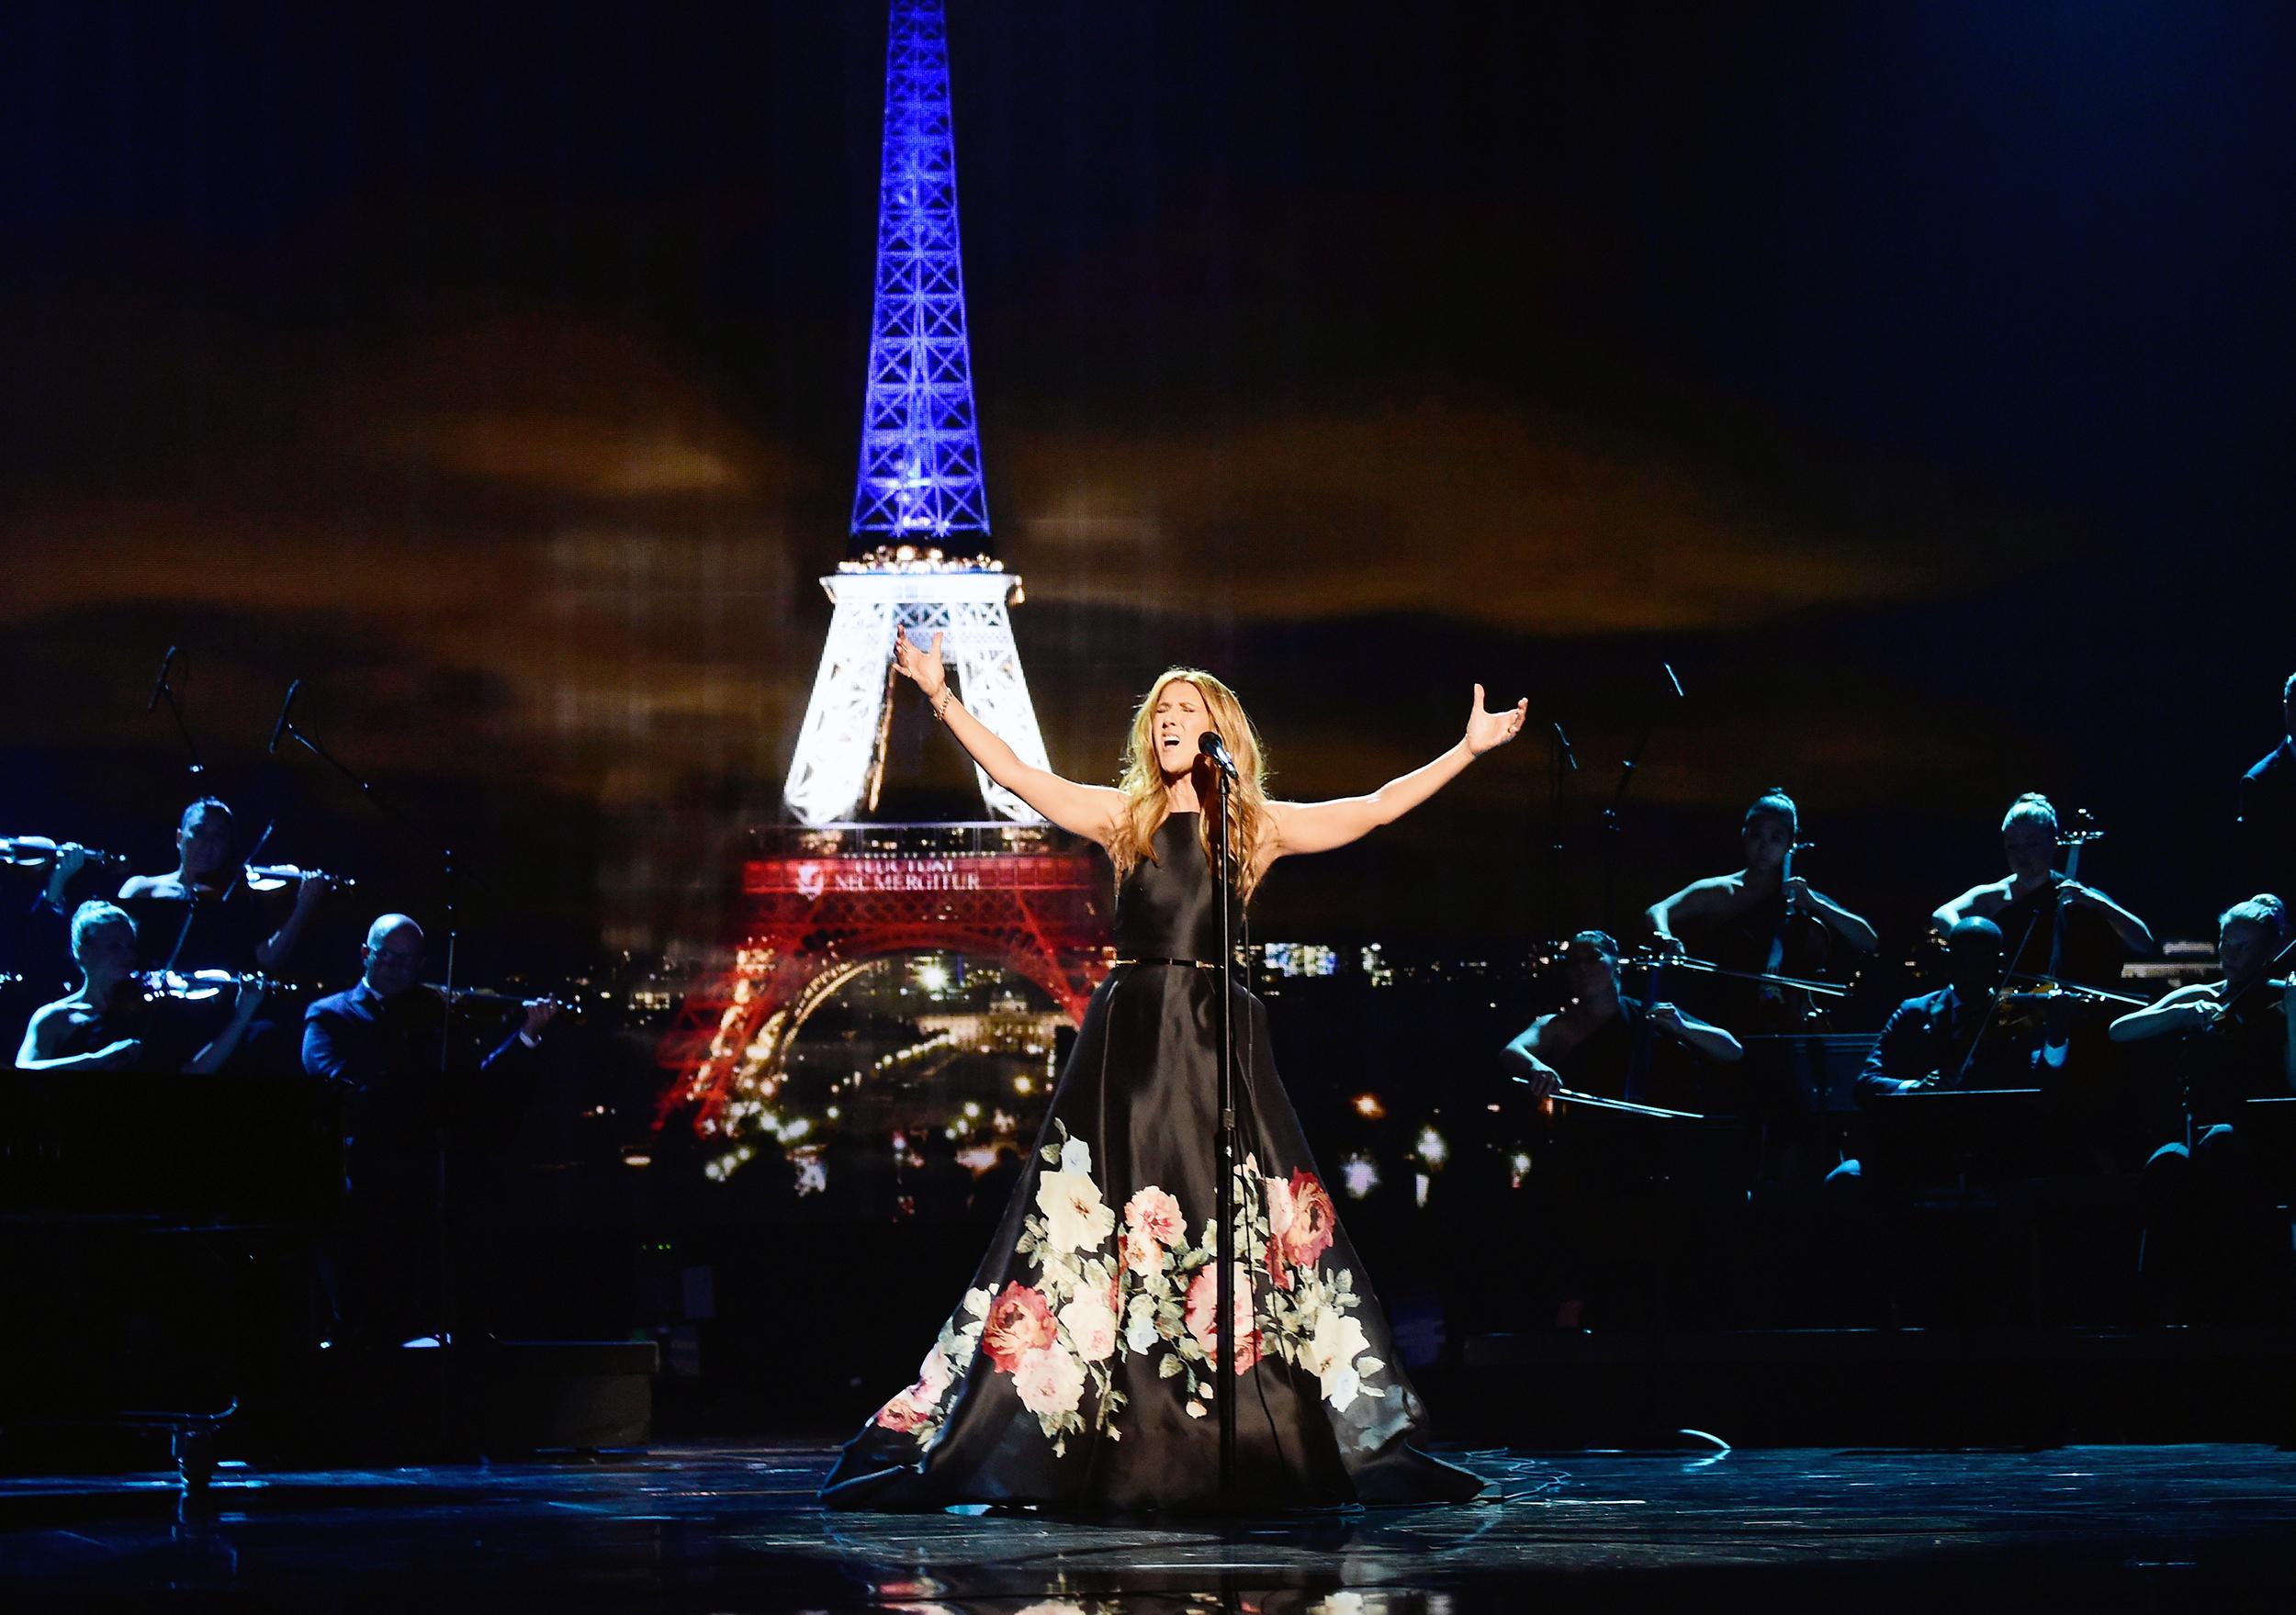 Celin Dion performing at 2015 AMAs